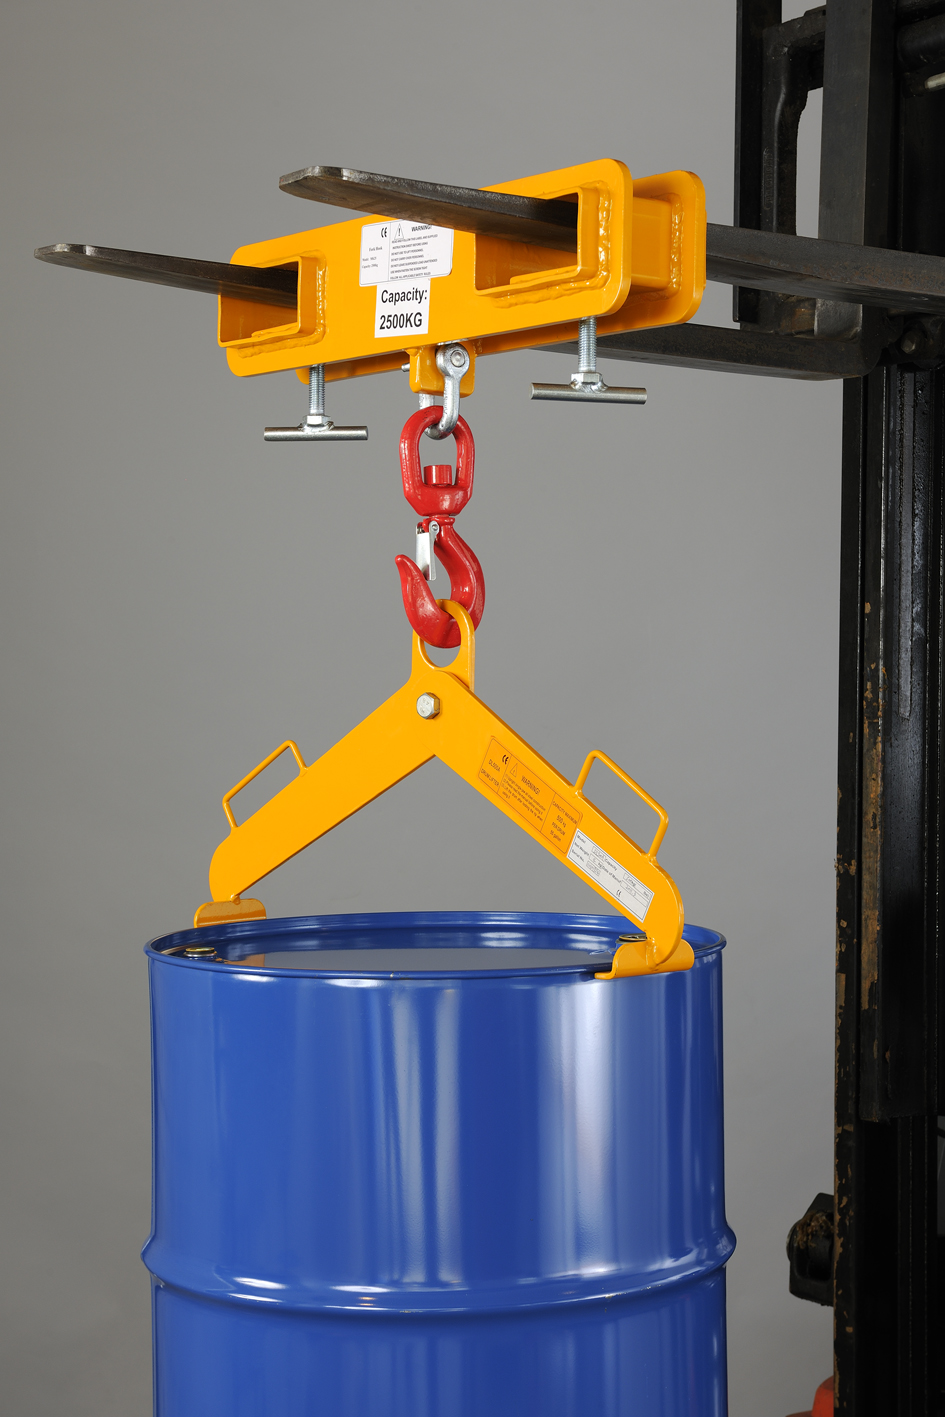 Model No Dls500 Horizontal Drum Lifter Ige Industrial